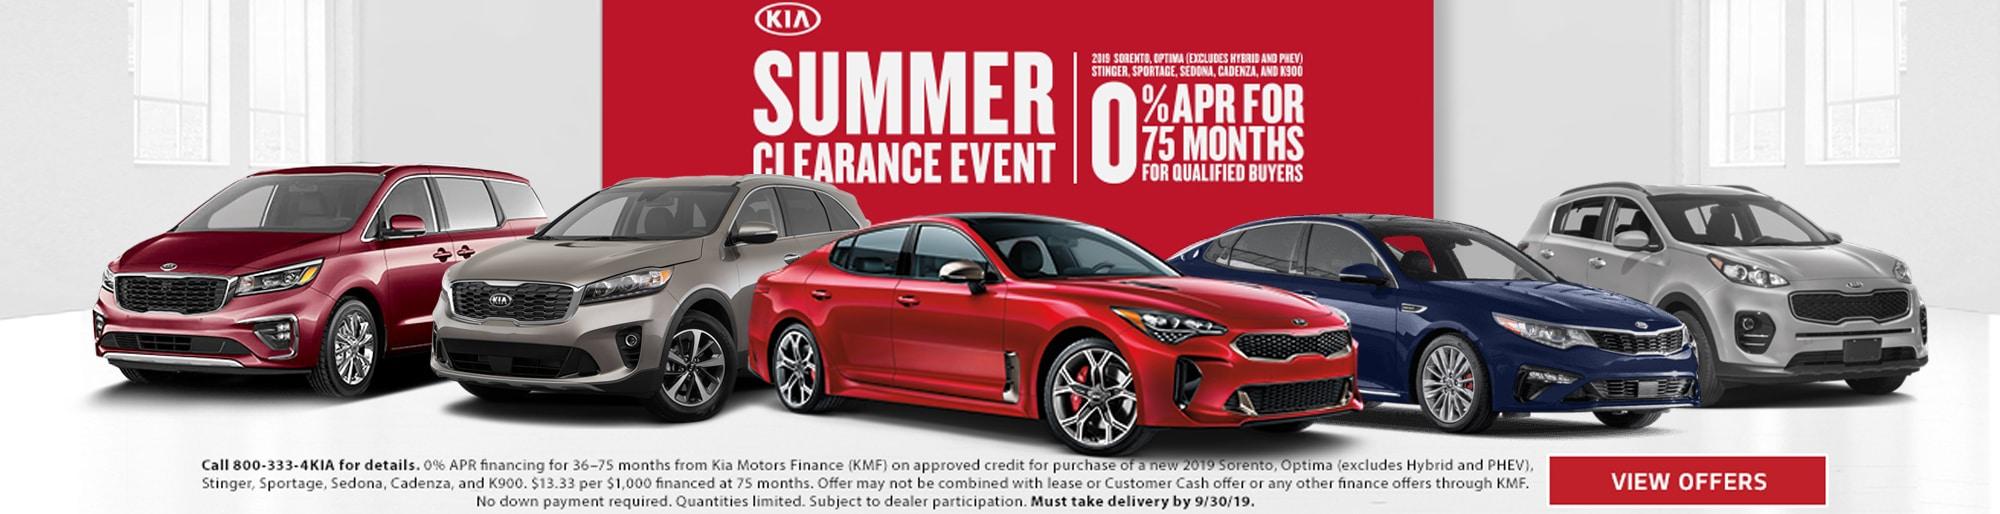 Car Pros Kia Carson >> Kia Of Carson New Kia Dealership In Carson Ca